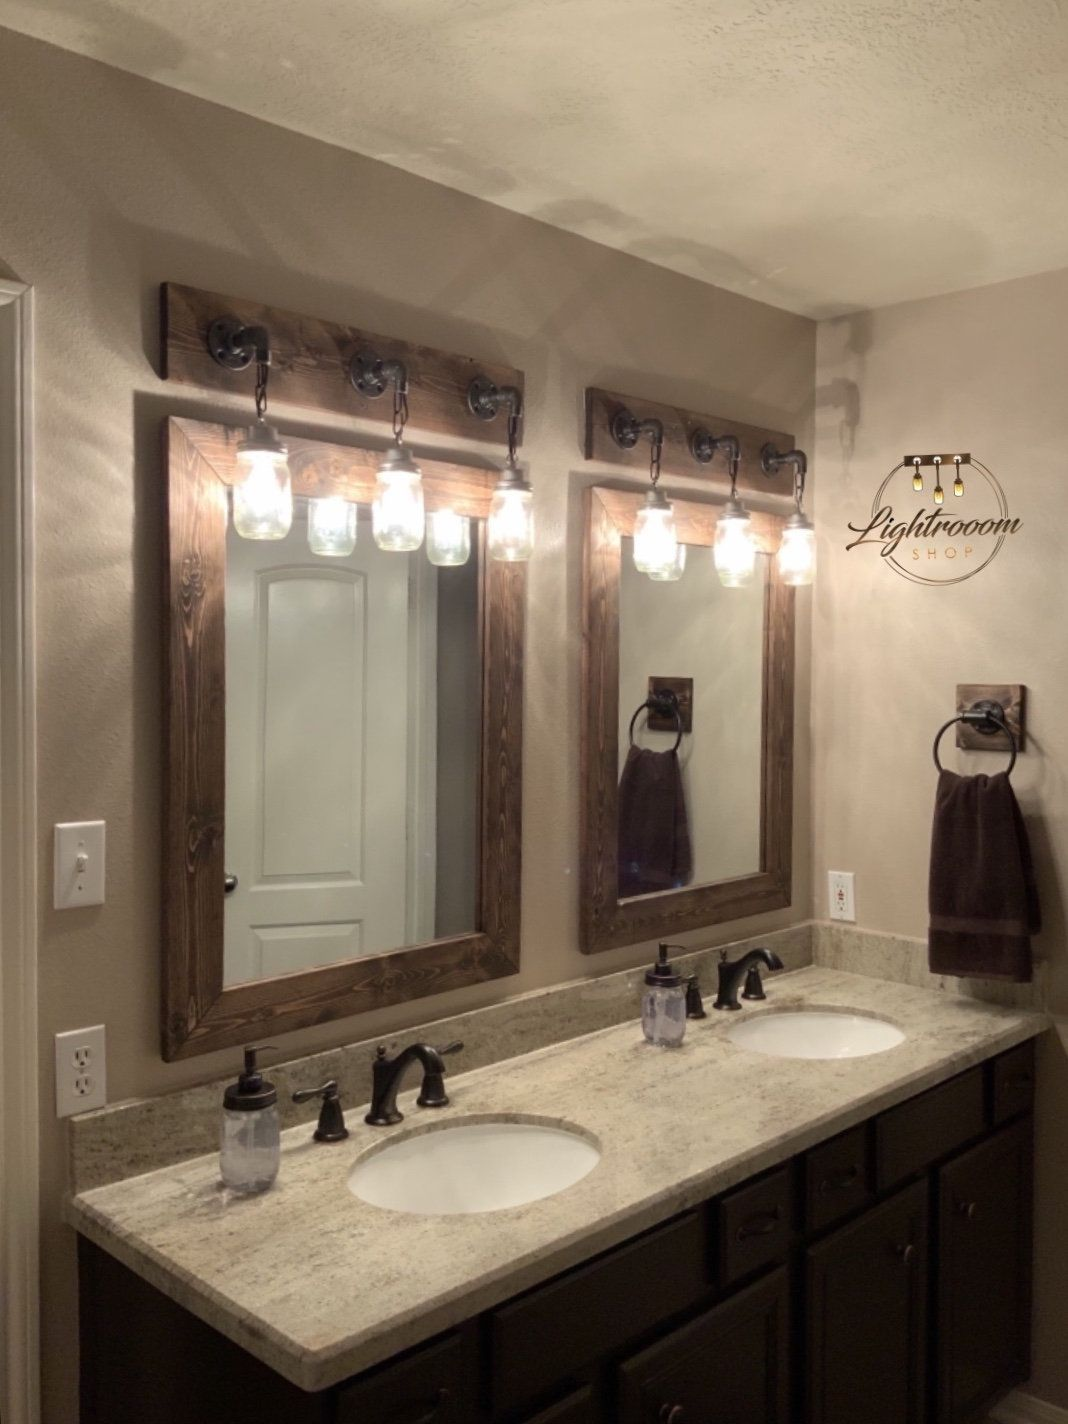 Dark Walnut Mirror Framed Mirror Rustic Wood Bathroom Mirror Wall Mirror Vanity Mirror L Large Bathroom Mirrors Bathroom Mirrors Diy Bathroom Mirror Frame [ 1424 x 1068 Pixel ]